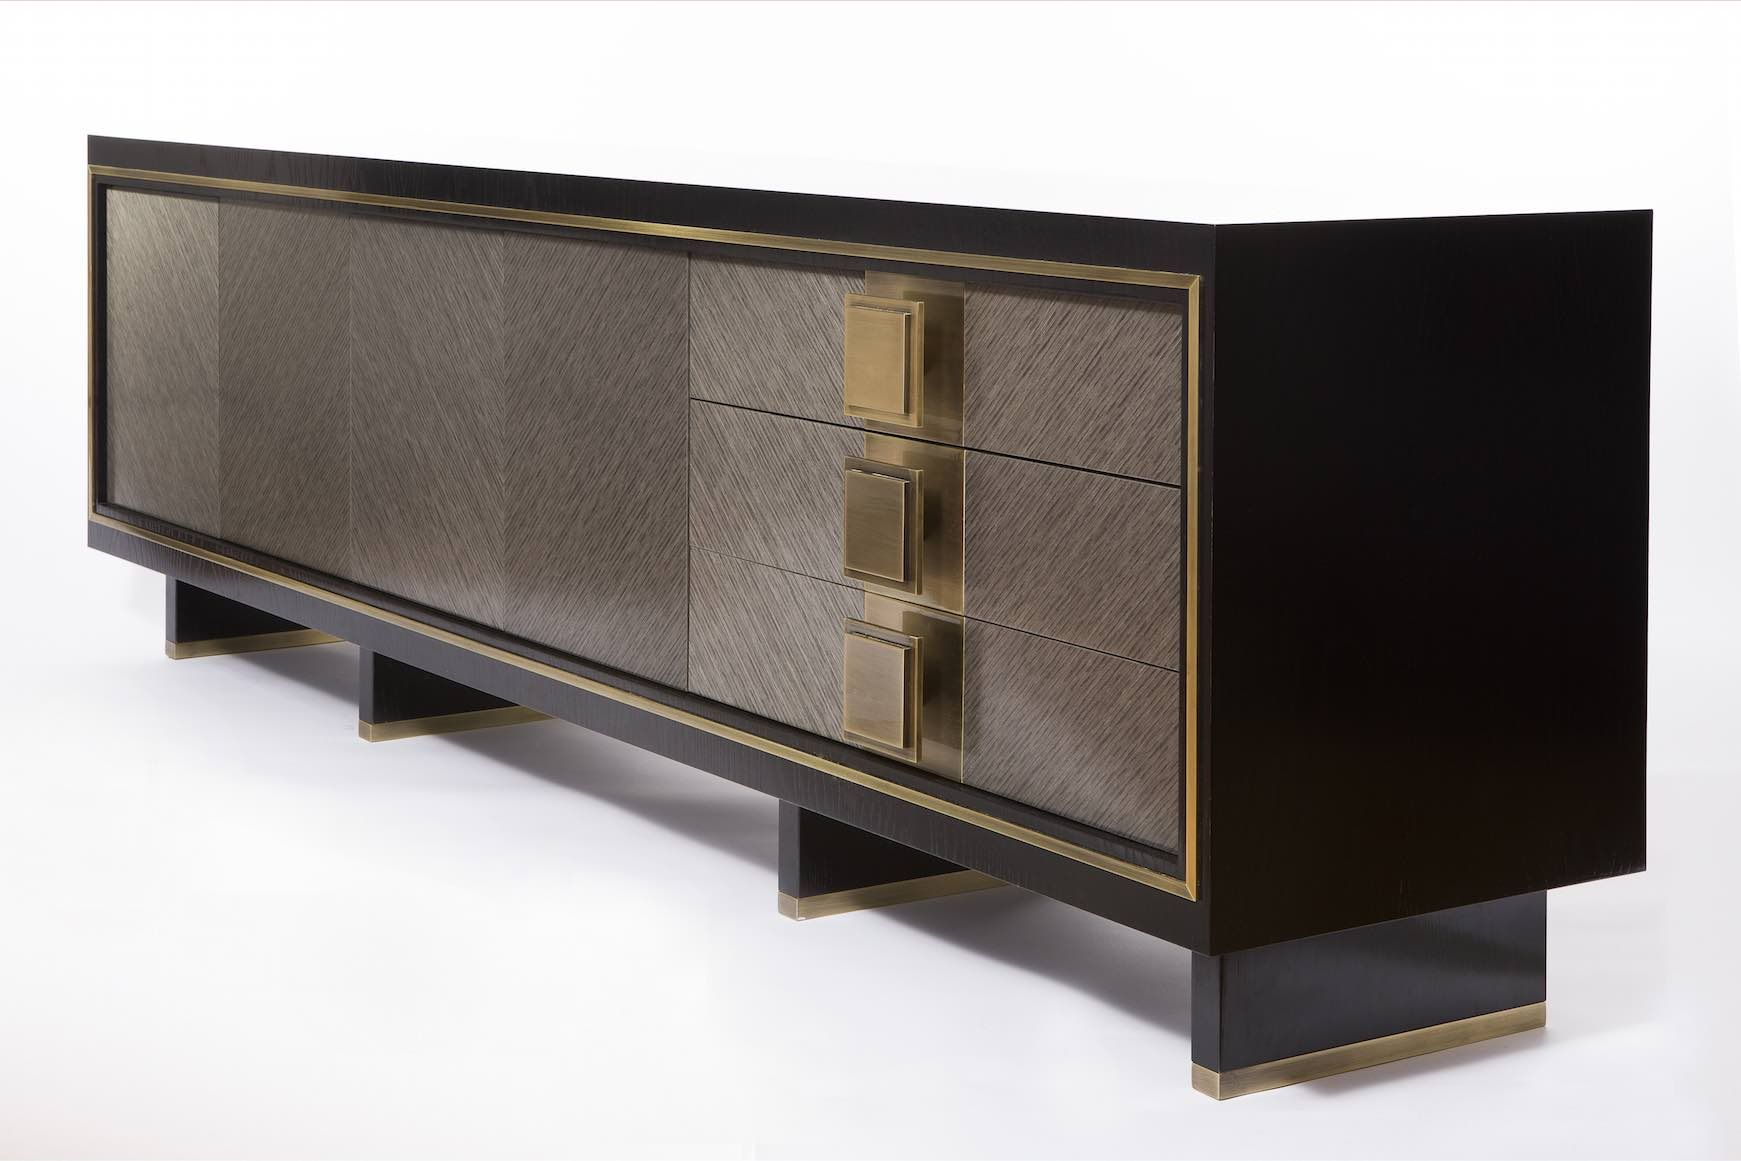 Luxury sideboard. Grey and dark sideboard. Golden details